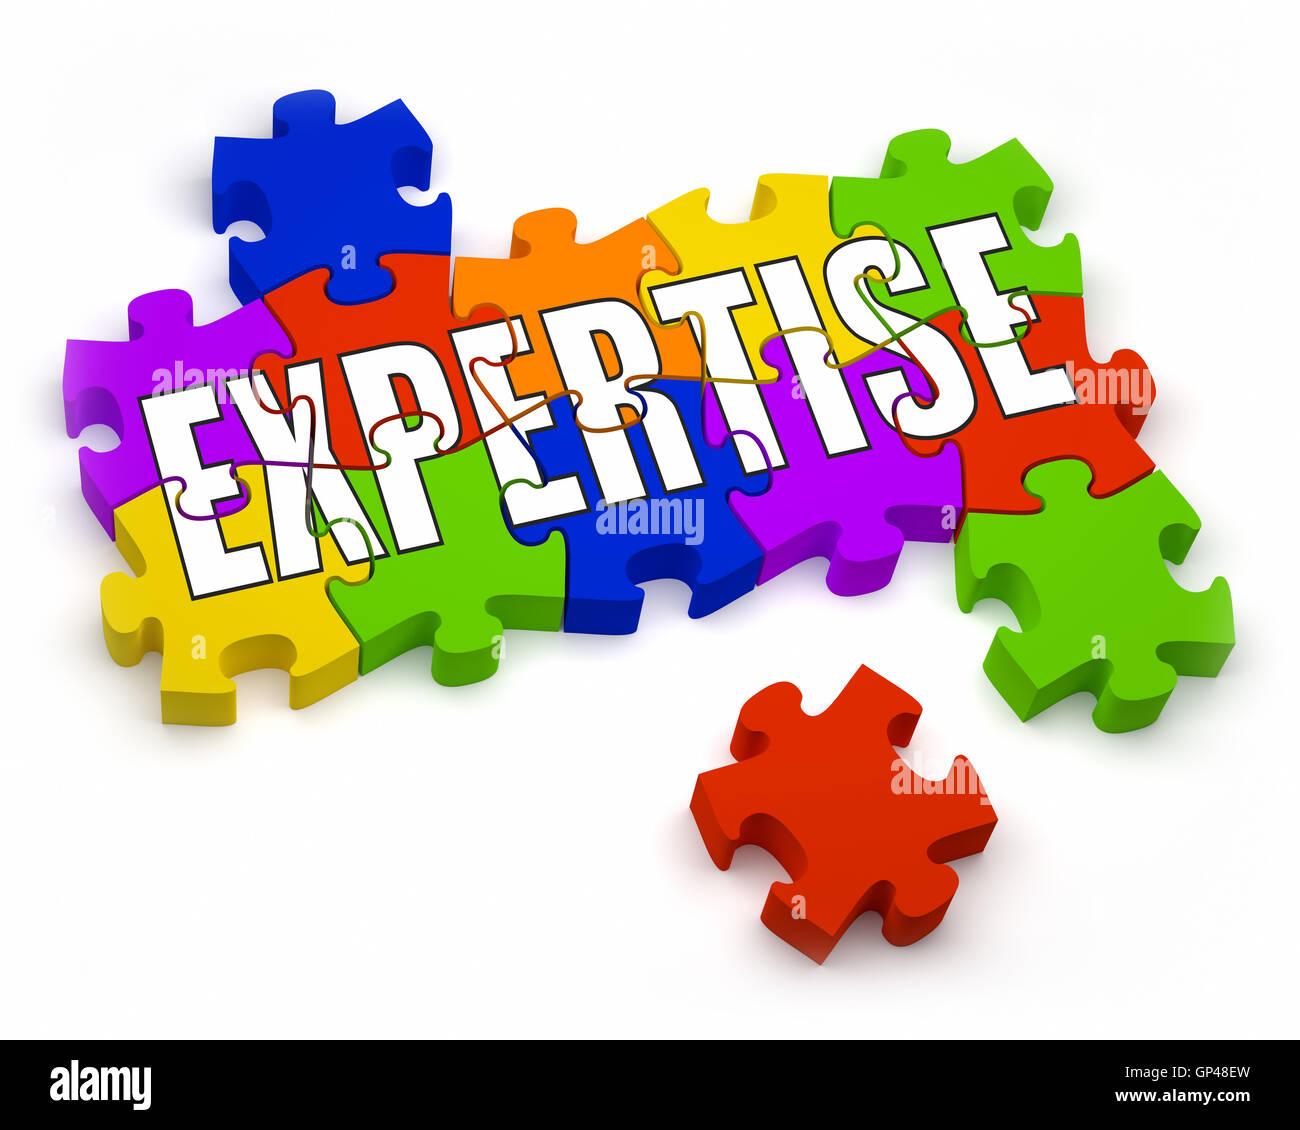 Expertise - Stock Image